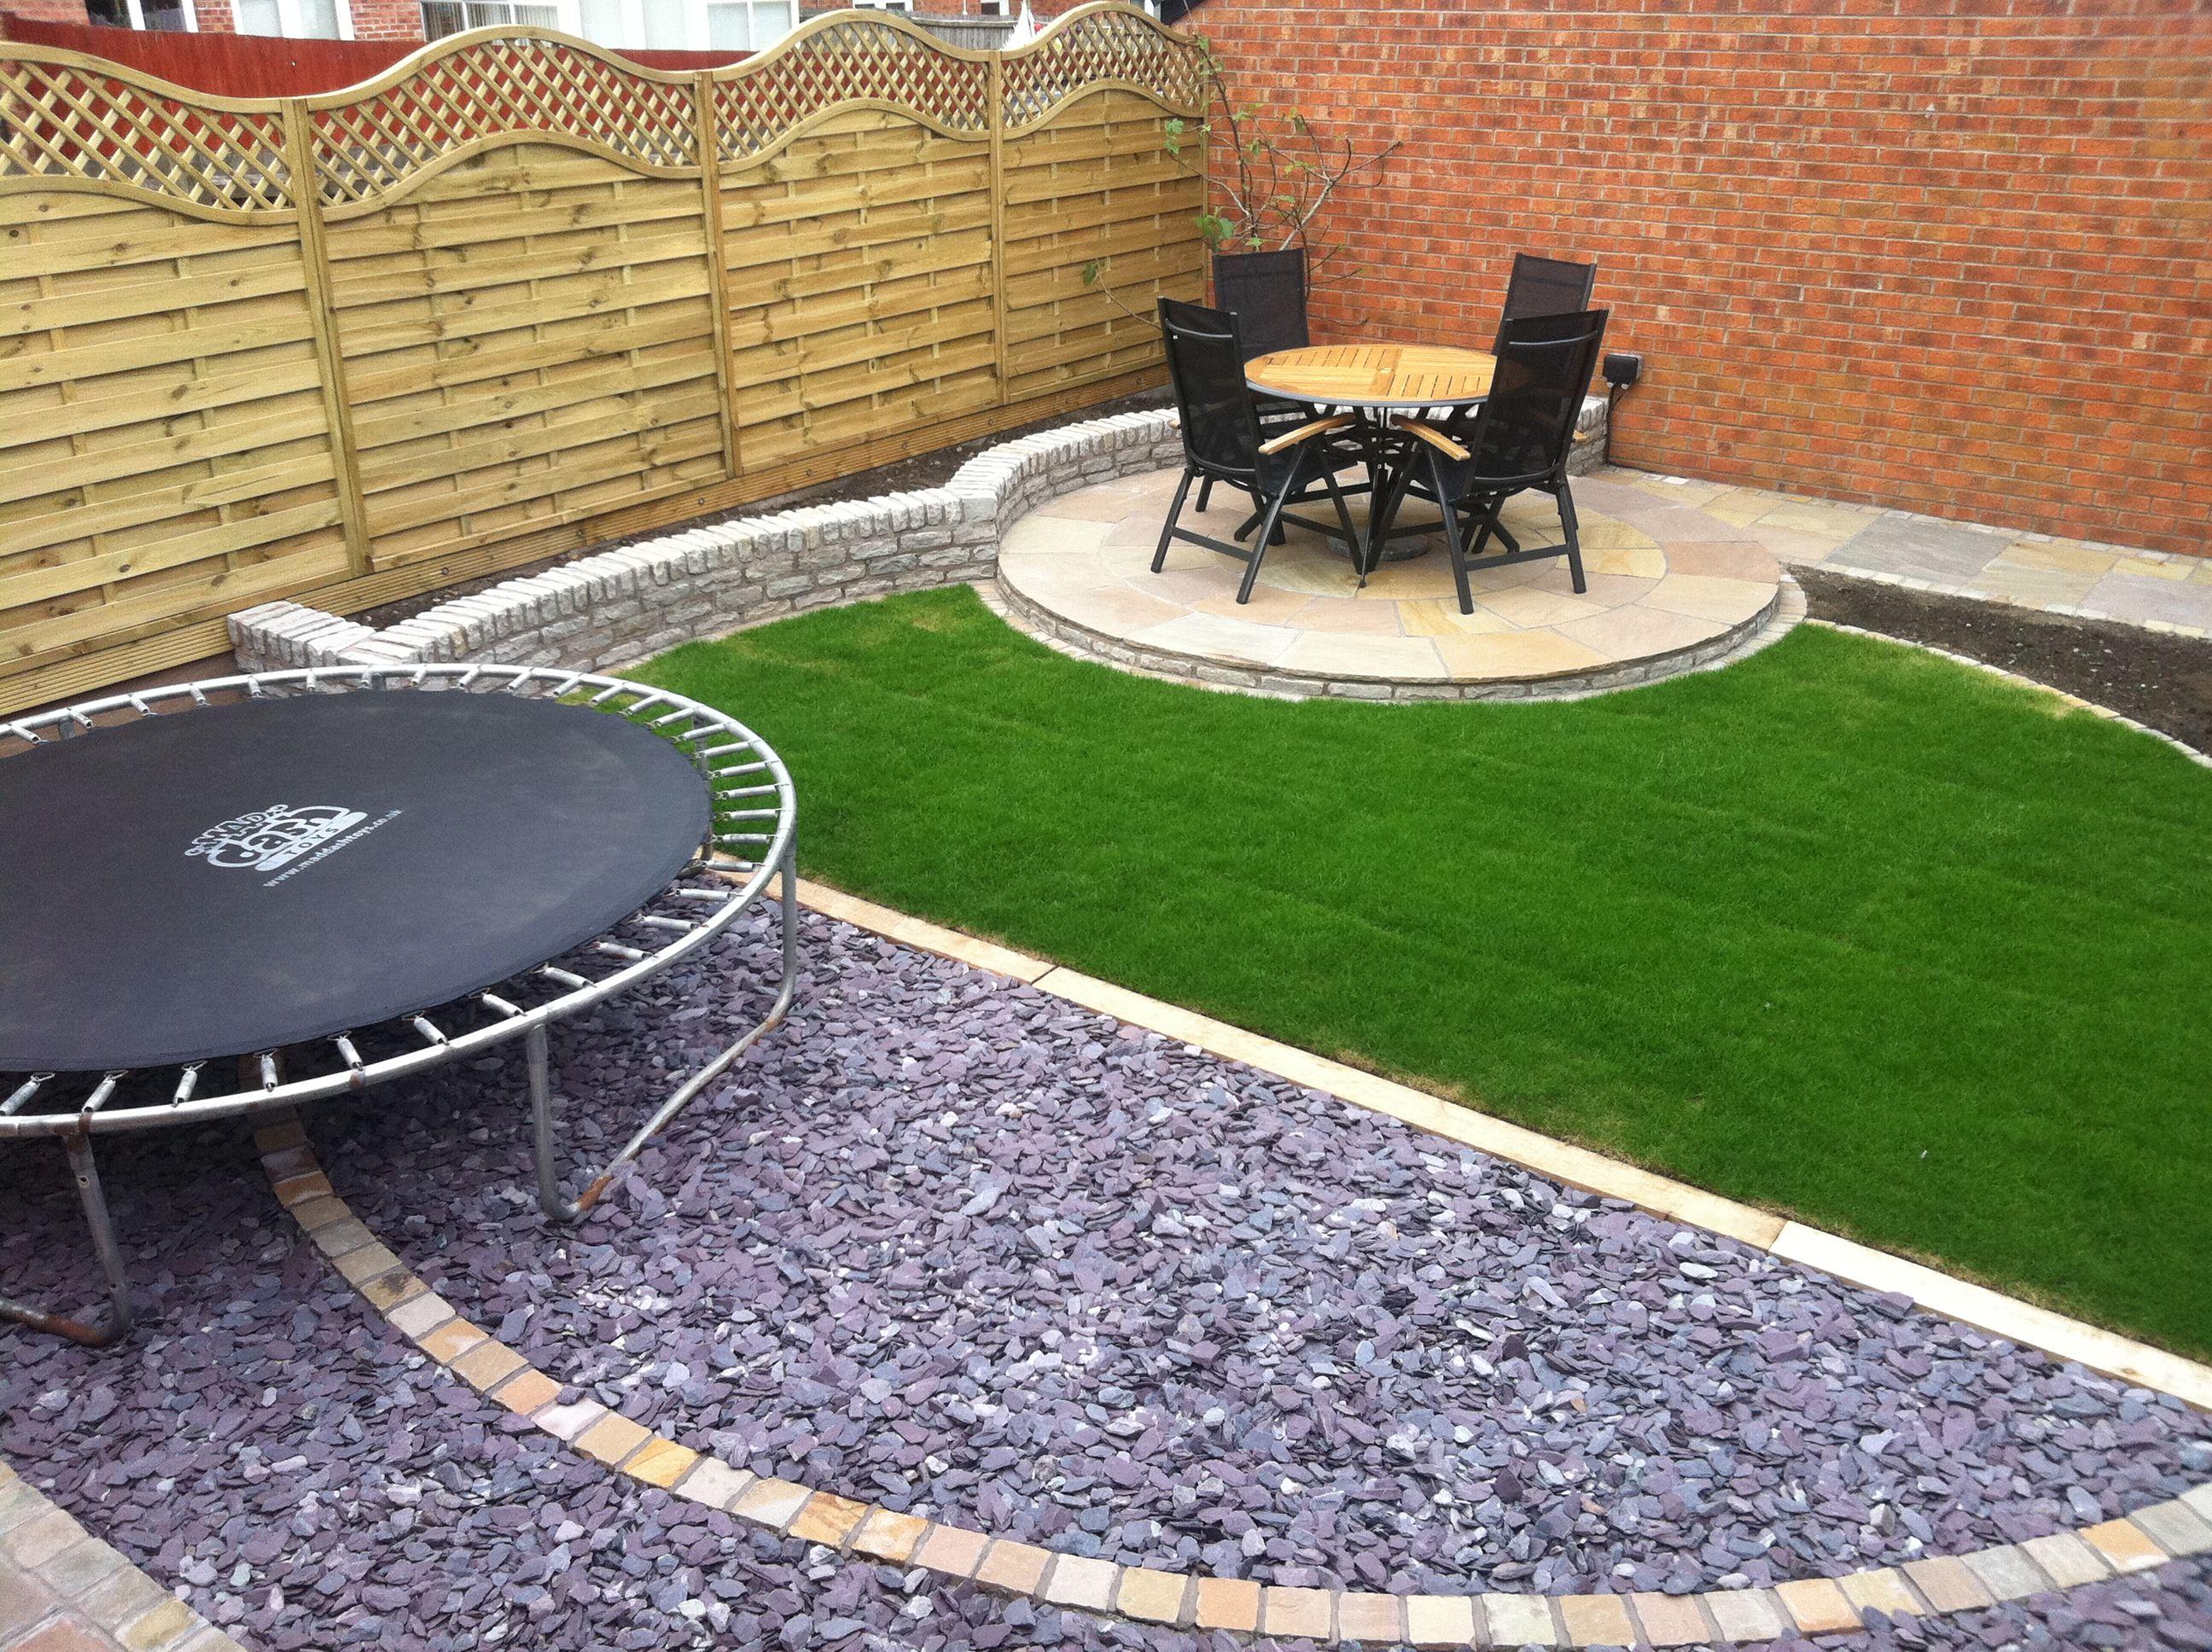 Landscaping Liverpool - Garden Makeover including ...